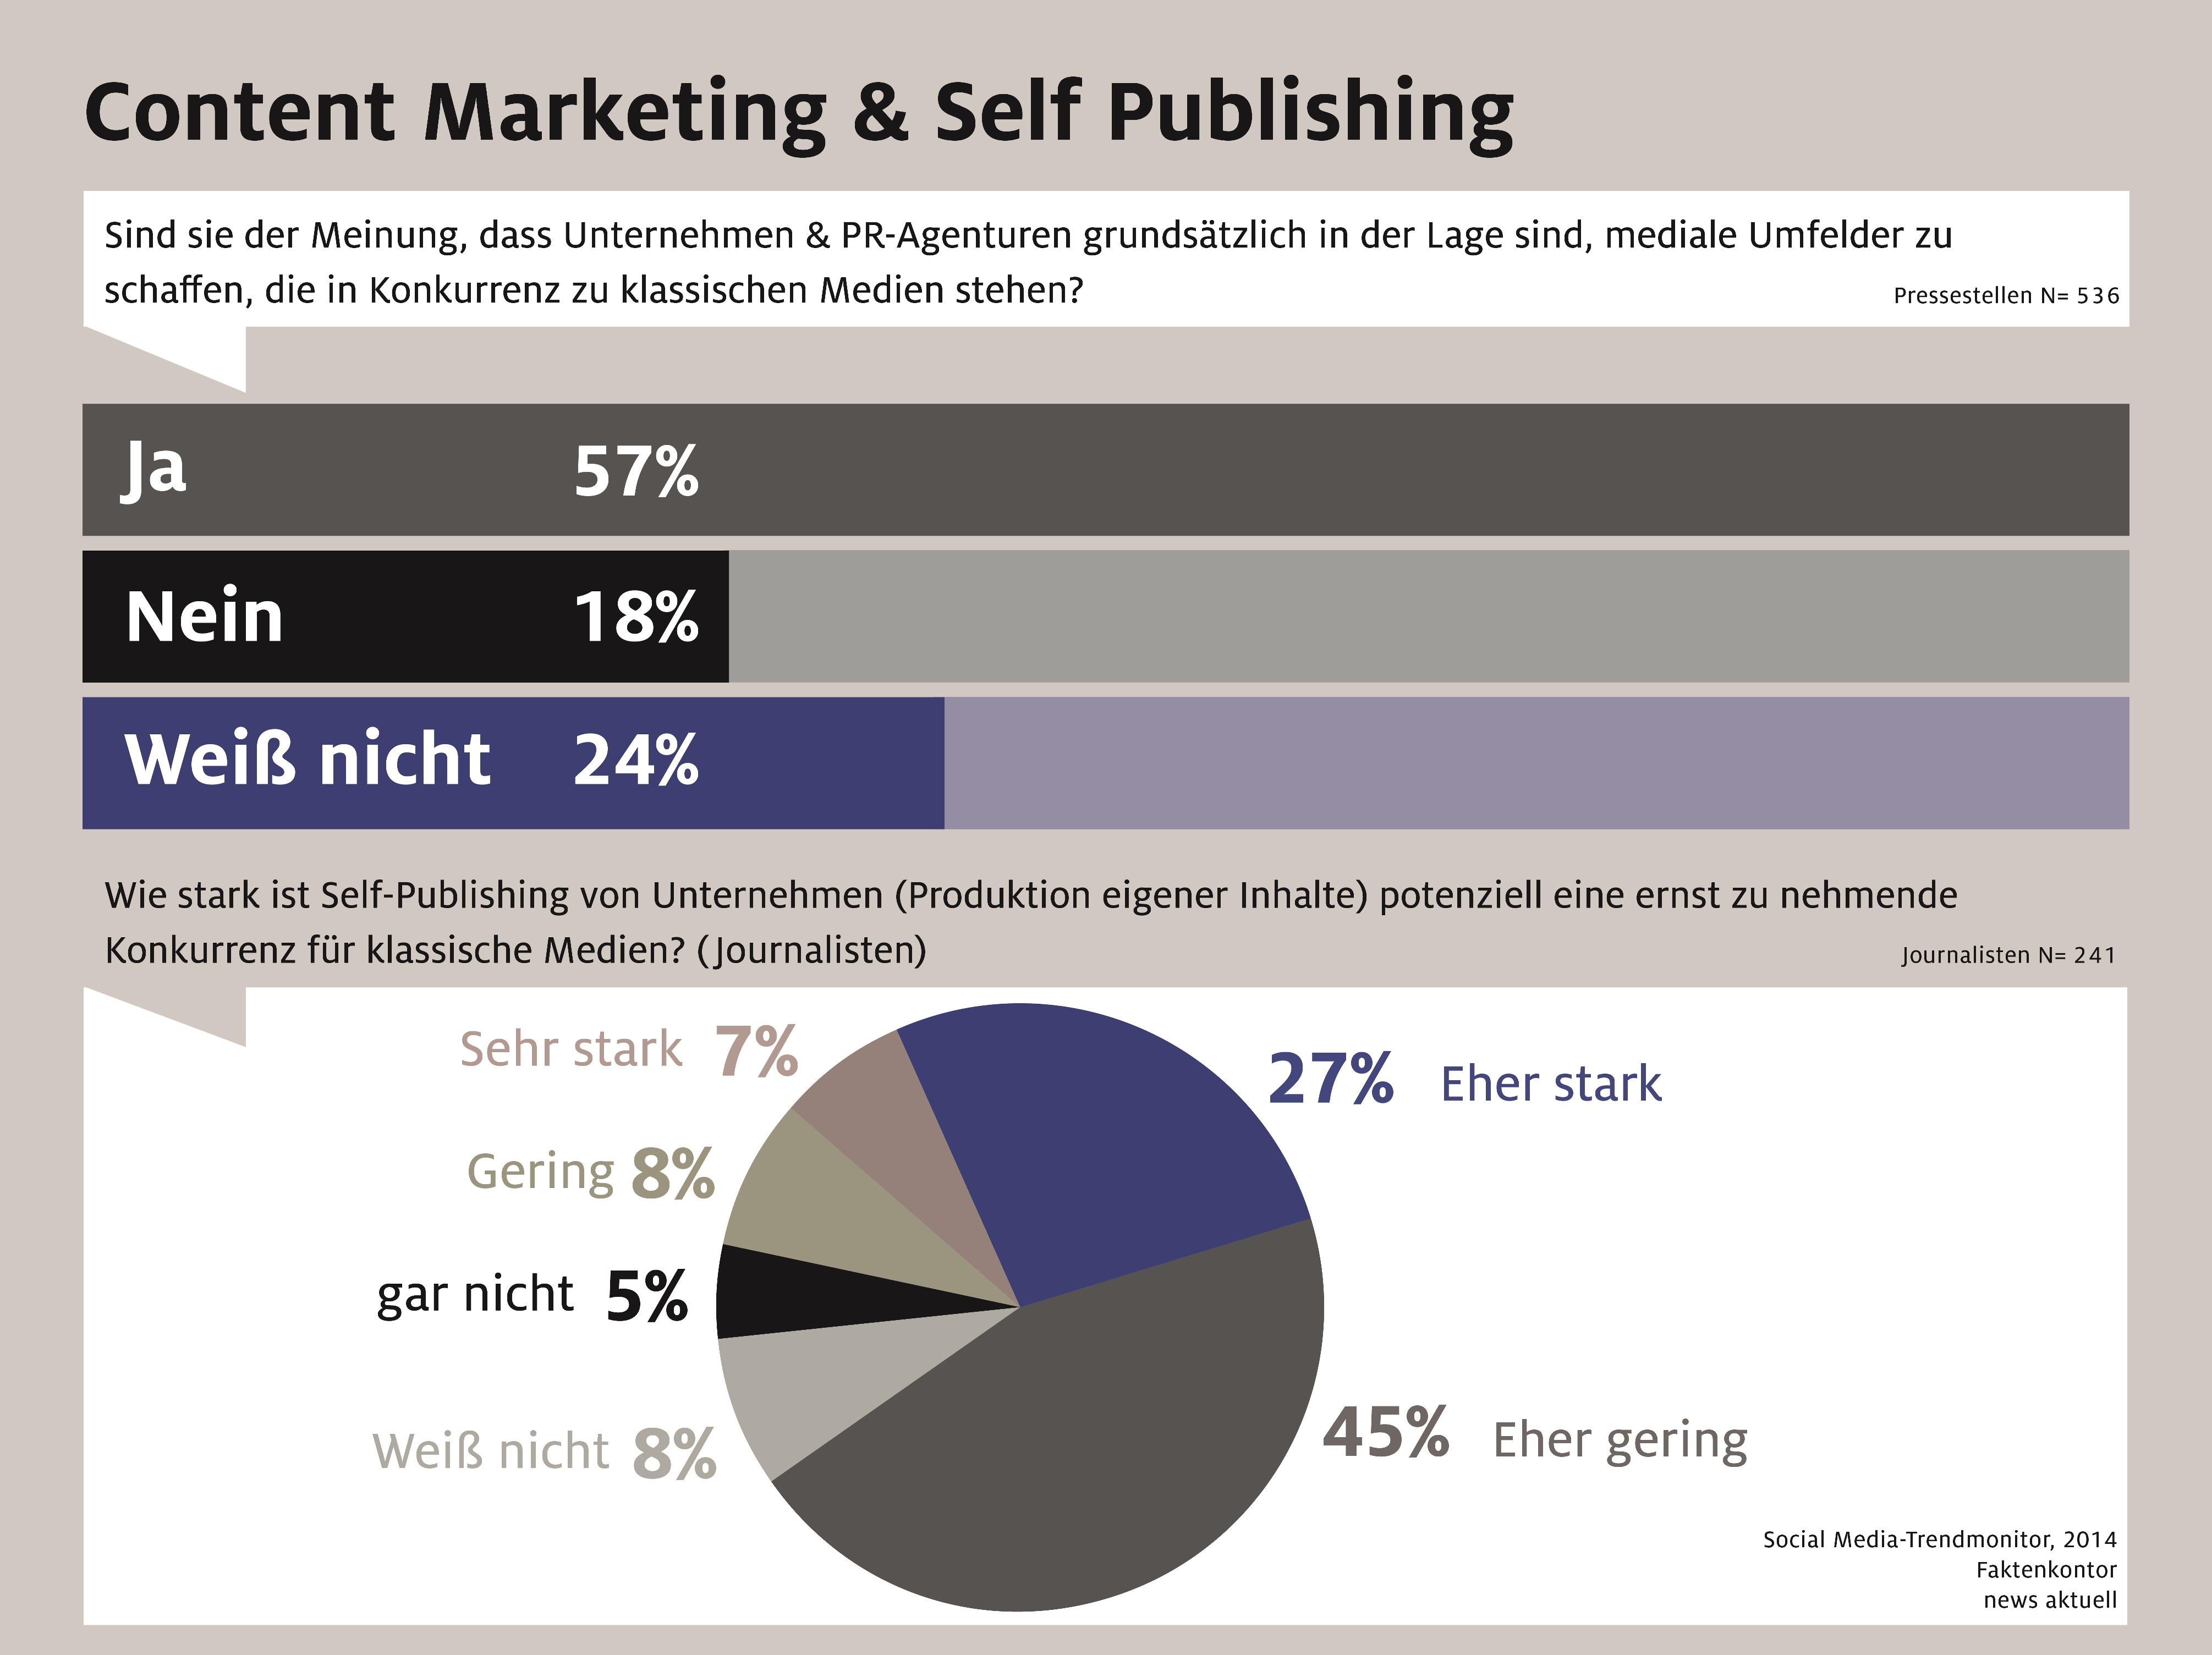 Content Marketing und Self Publishing 2